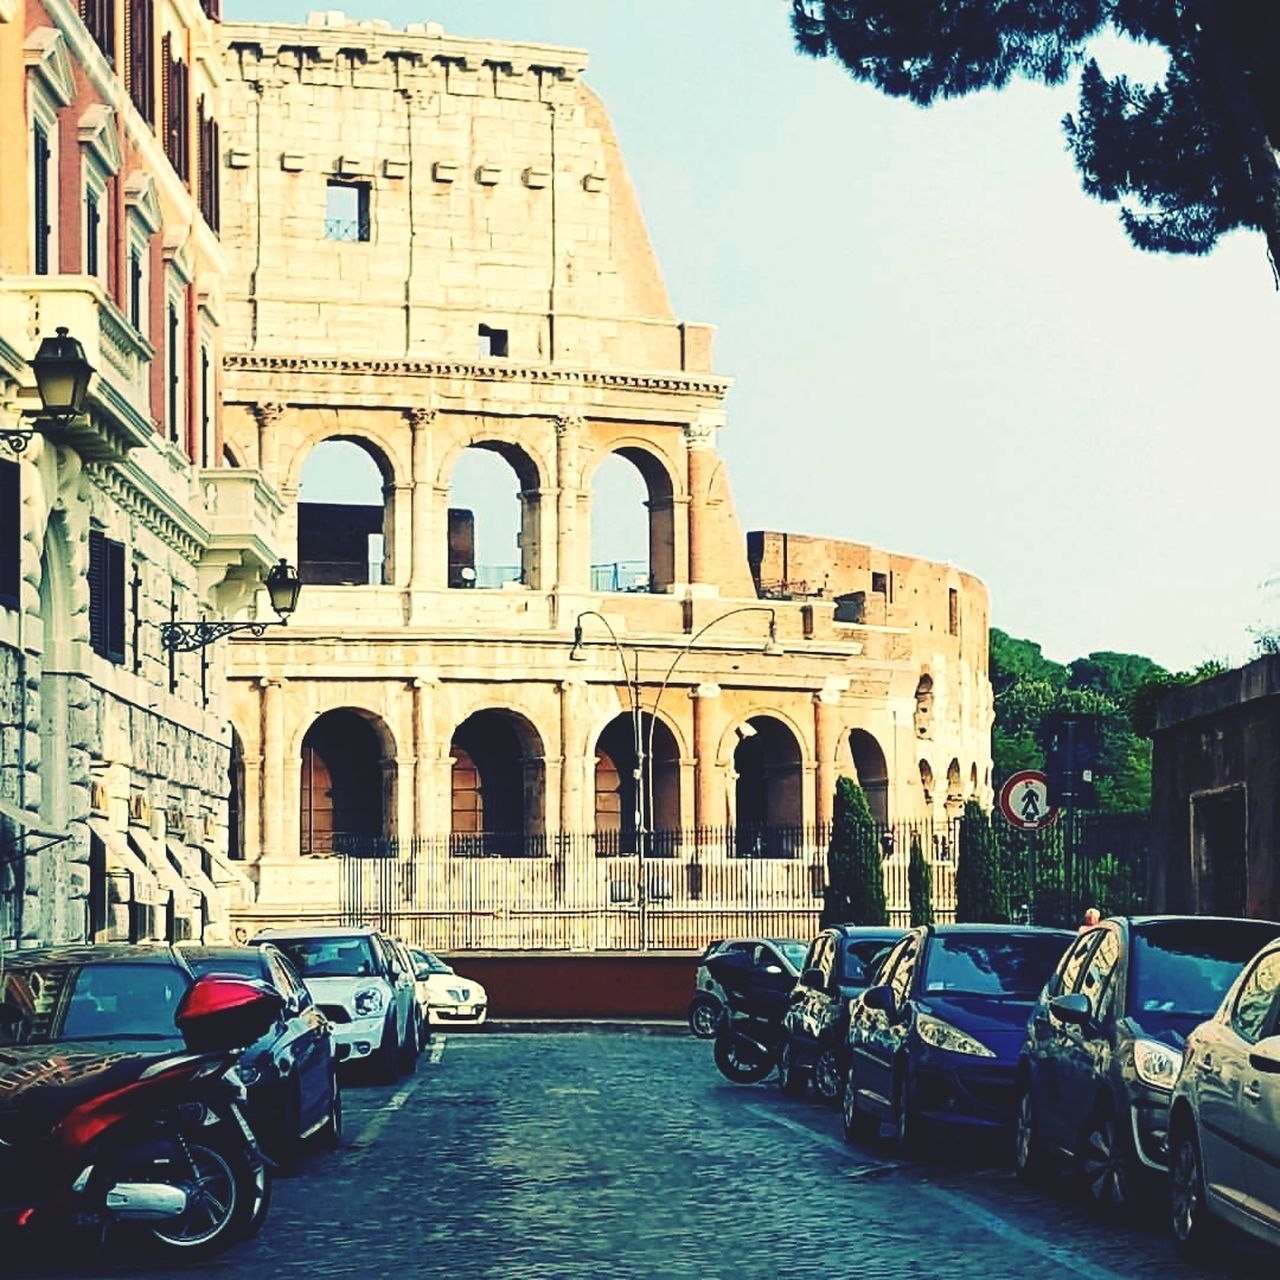 Architecture History Built Structure Ancient Rome Italy Colloseum Tourism Architecture